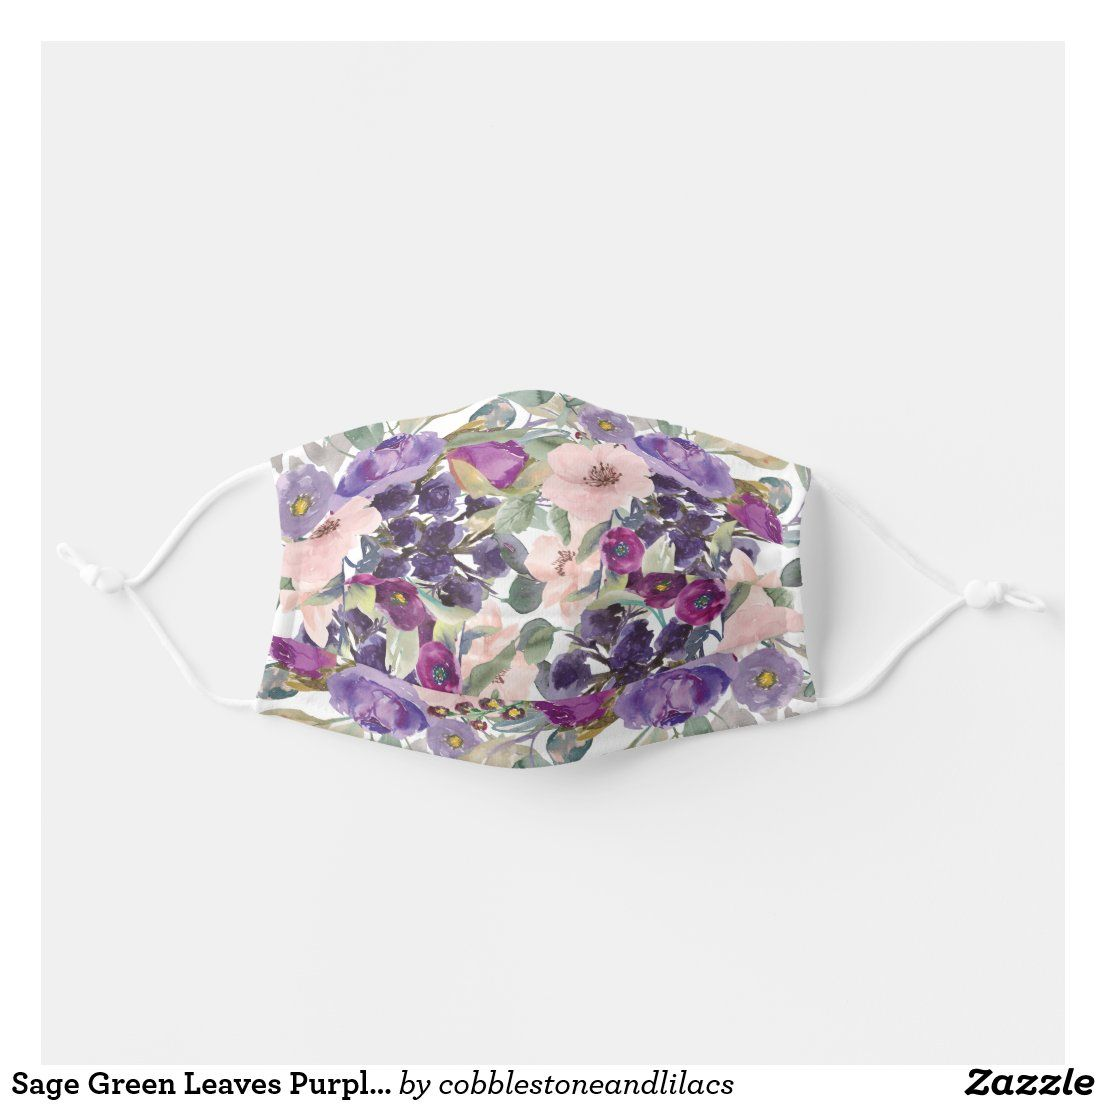 Sage Green Leaves Purple Blush Pink Flowers Adult